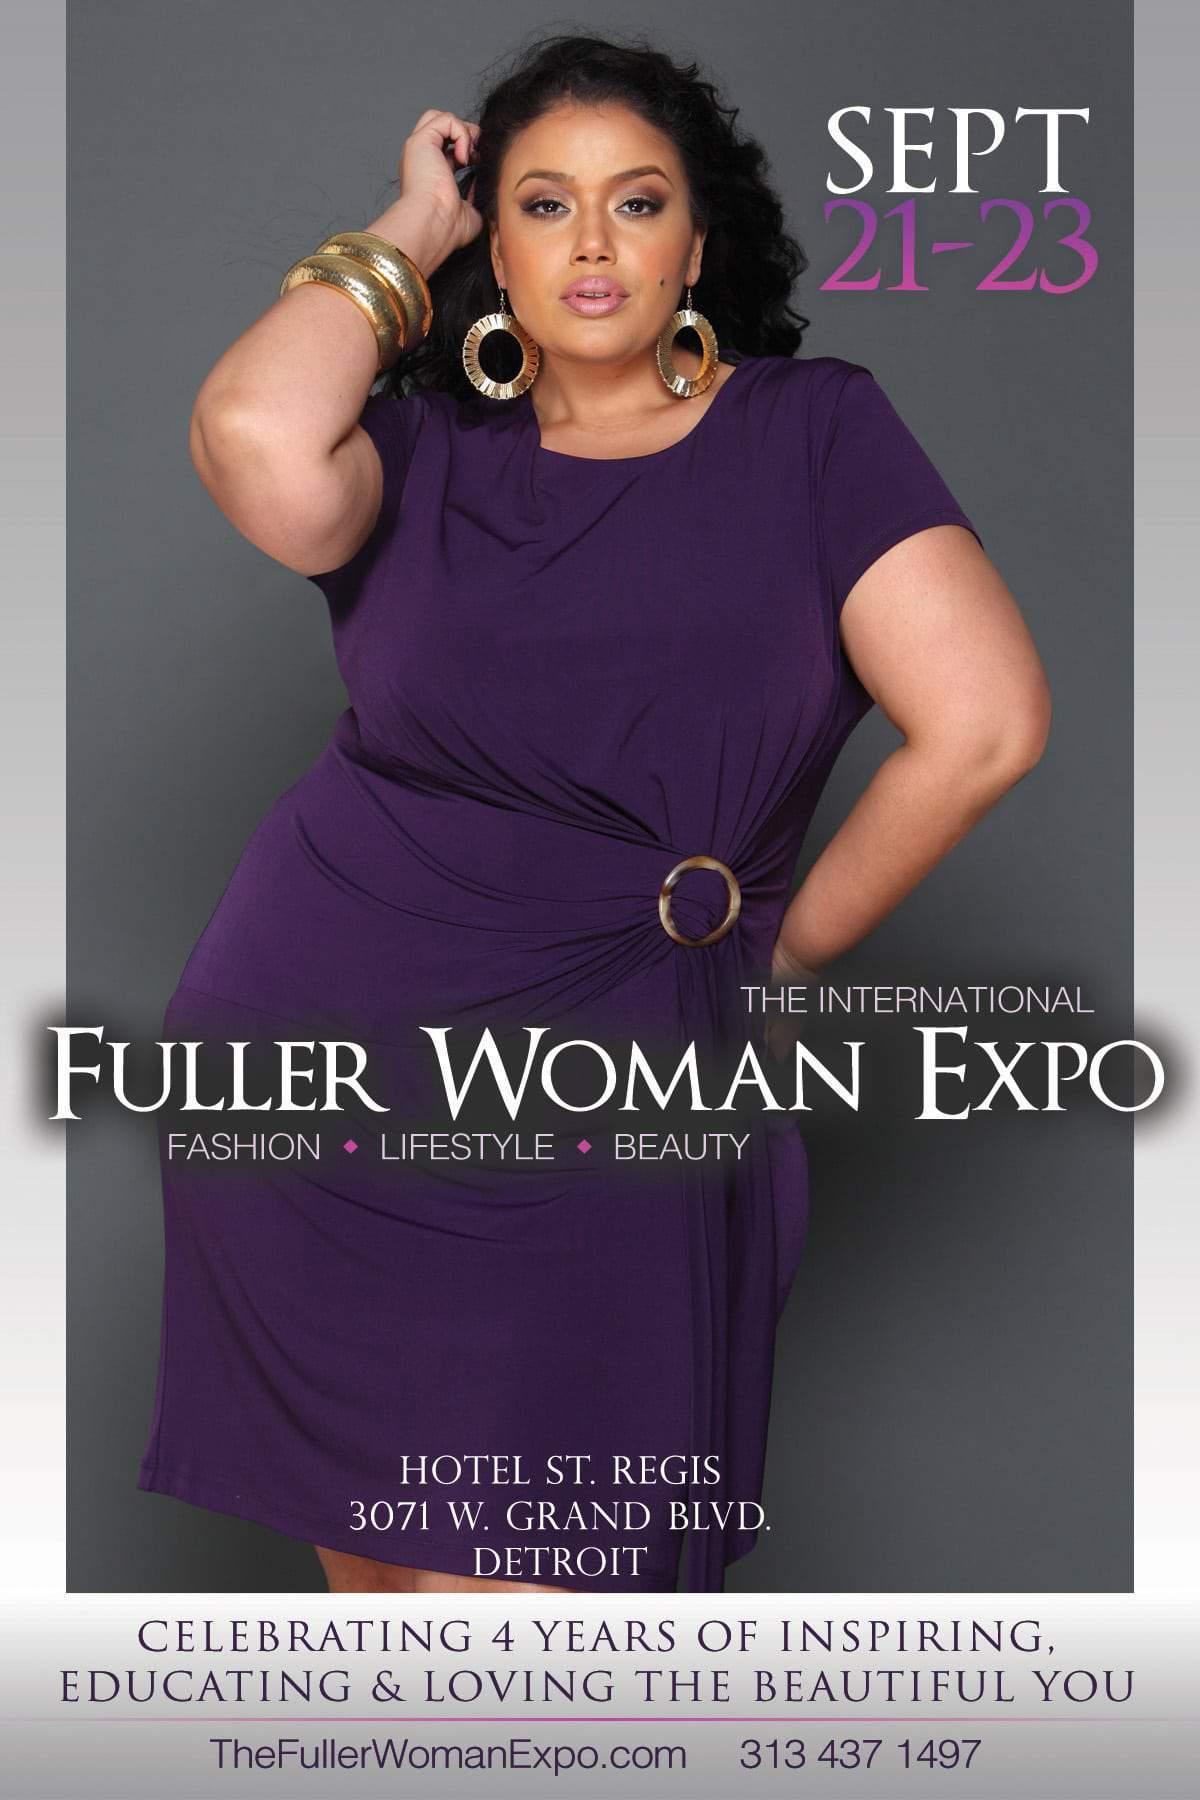 The 2012 International Fuller Woman Expo Returns to Detroit!